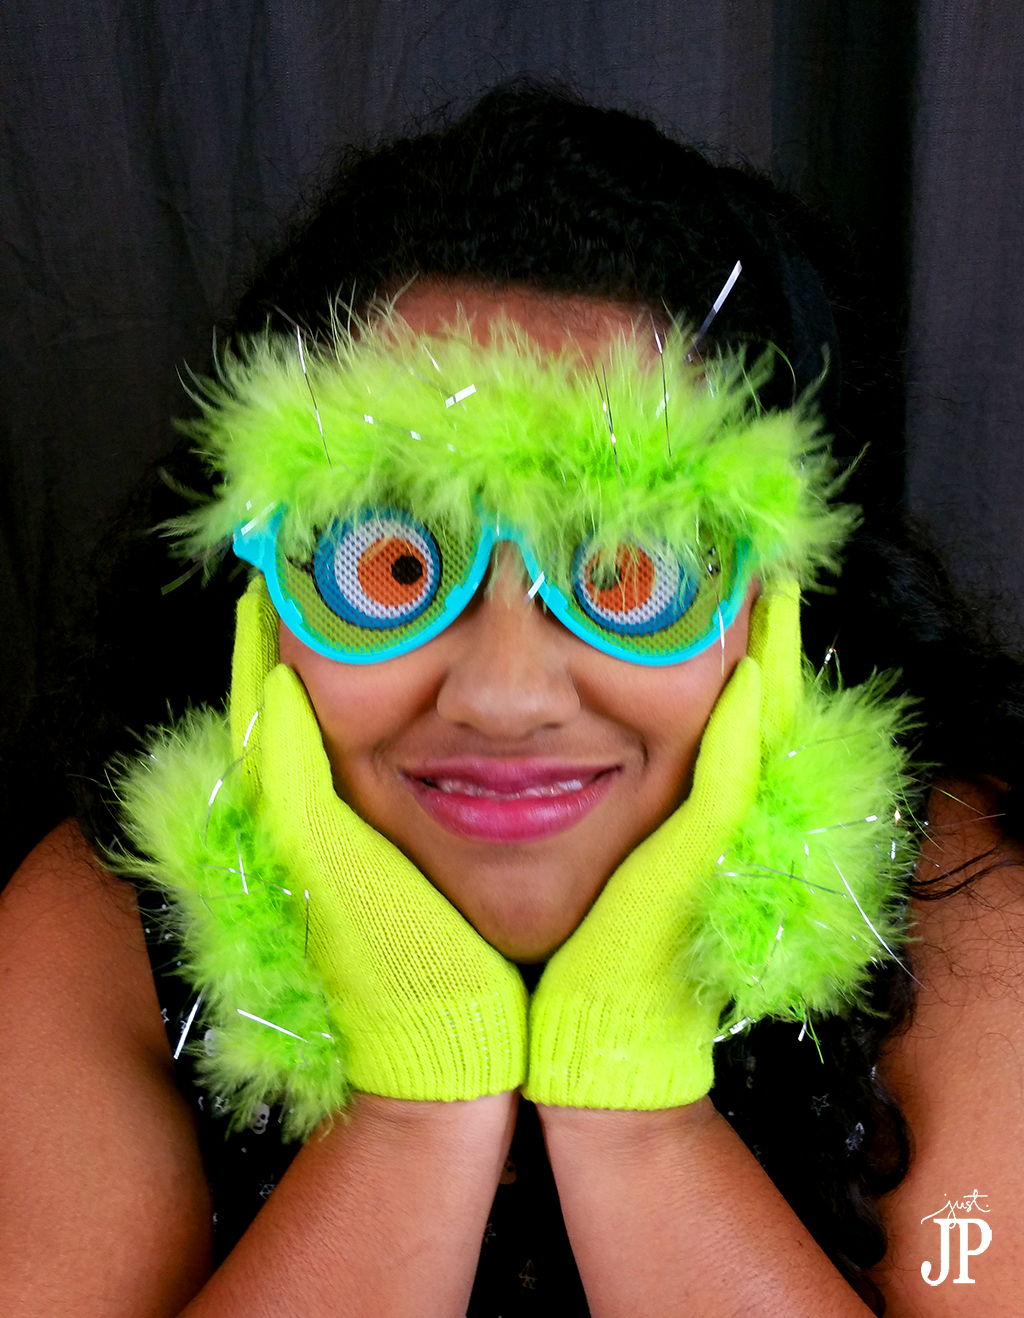 Monster-Hands-and-Glasses-JPriest